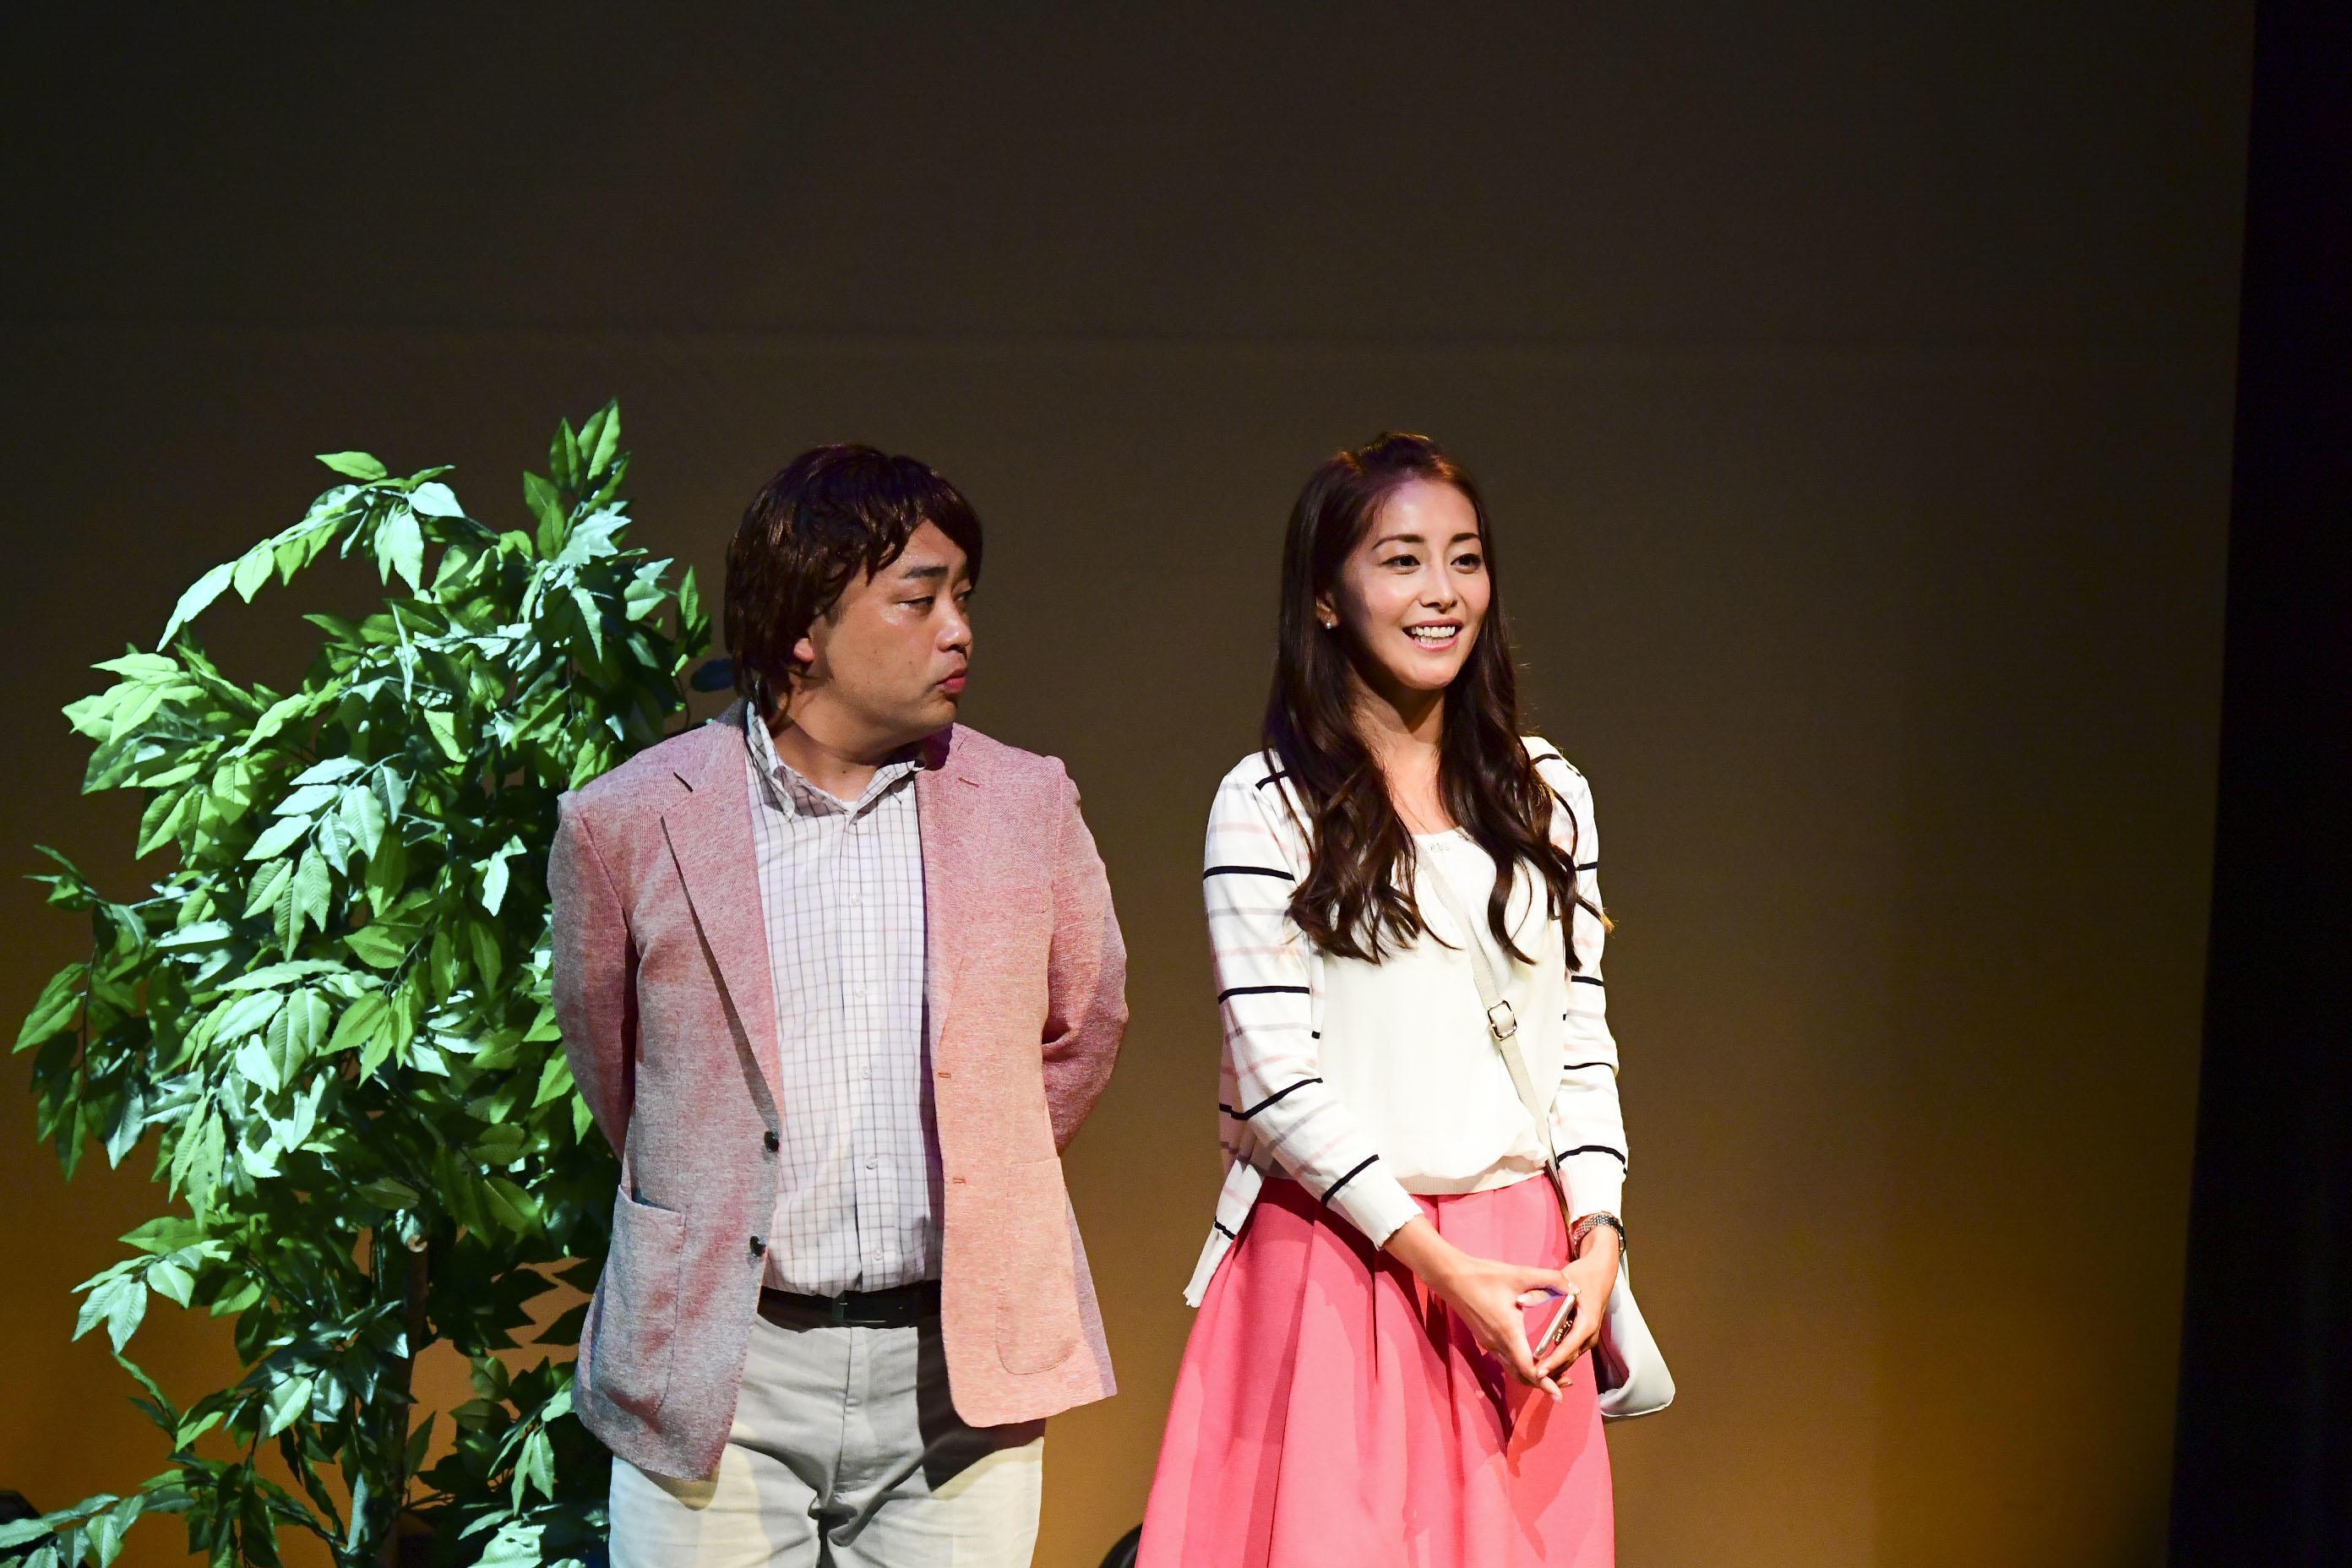 http://news.yoshimoto.co.jp/20170805012111-ebd36a73c8e9b277723feed584fd8aac85721b90.jpg